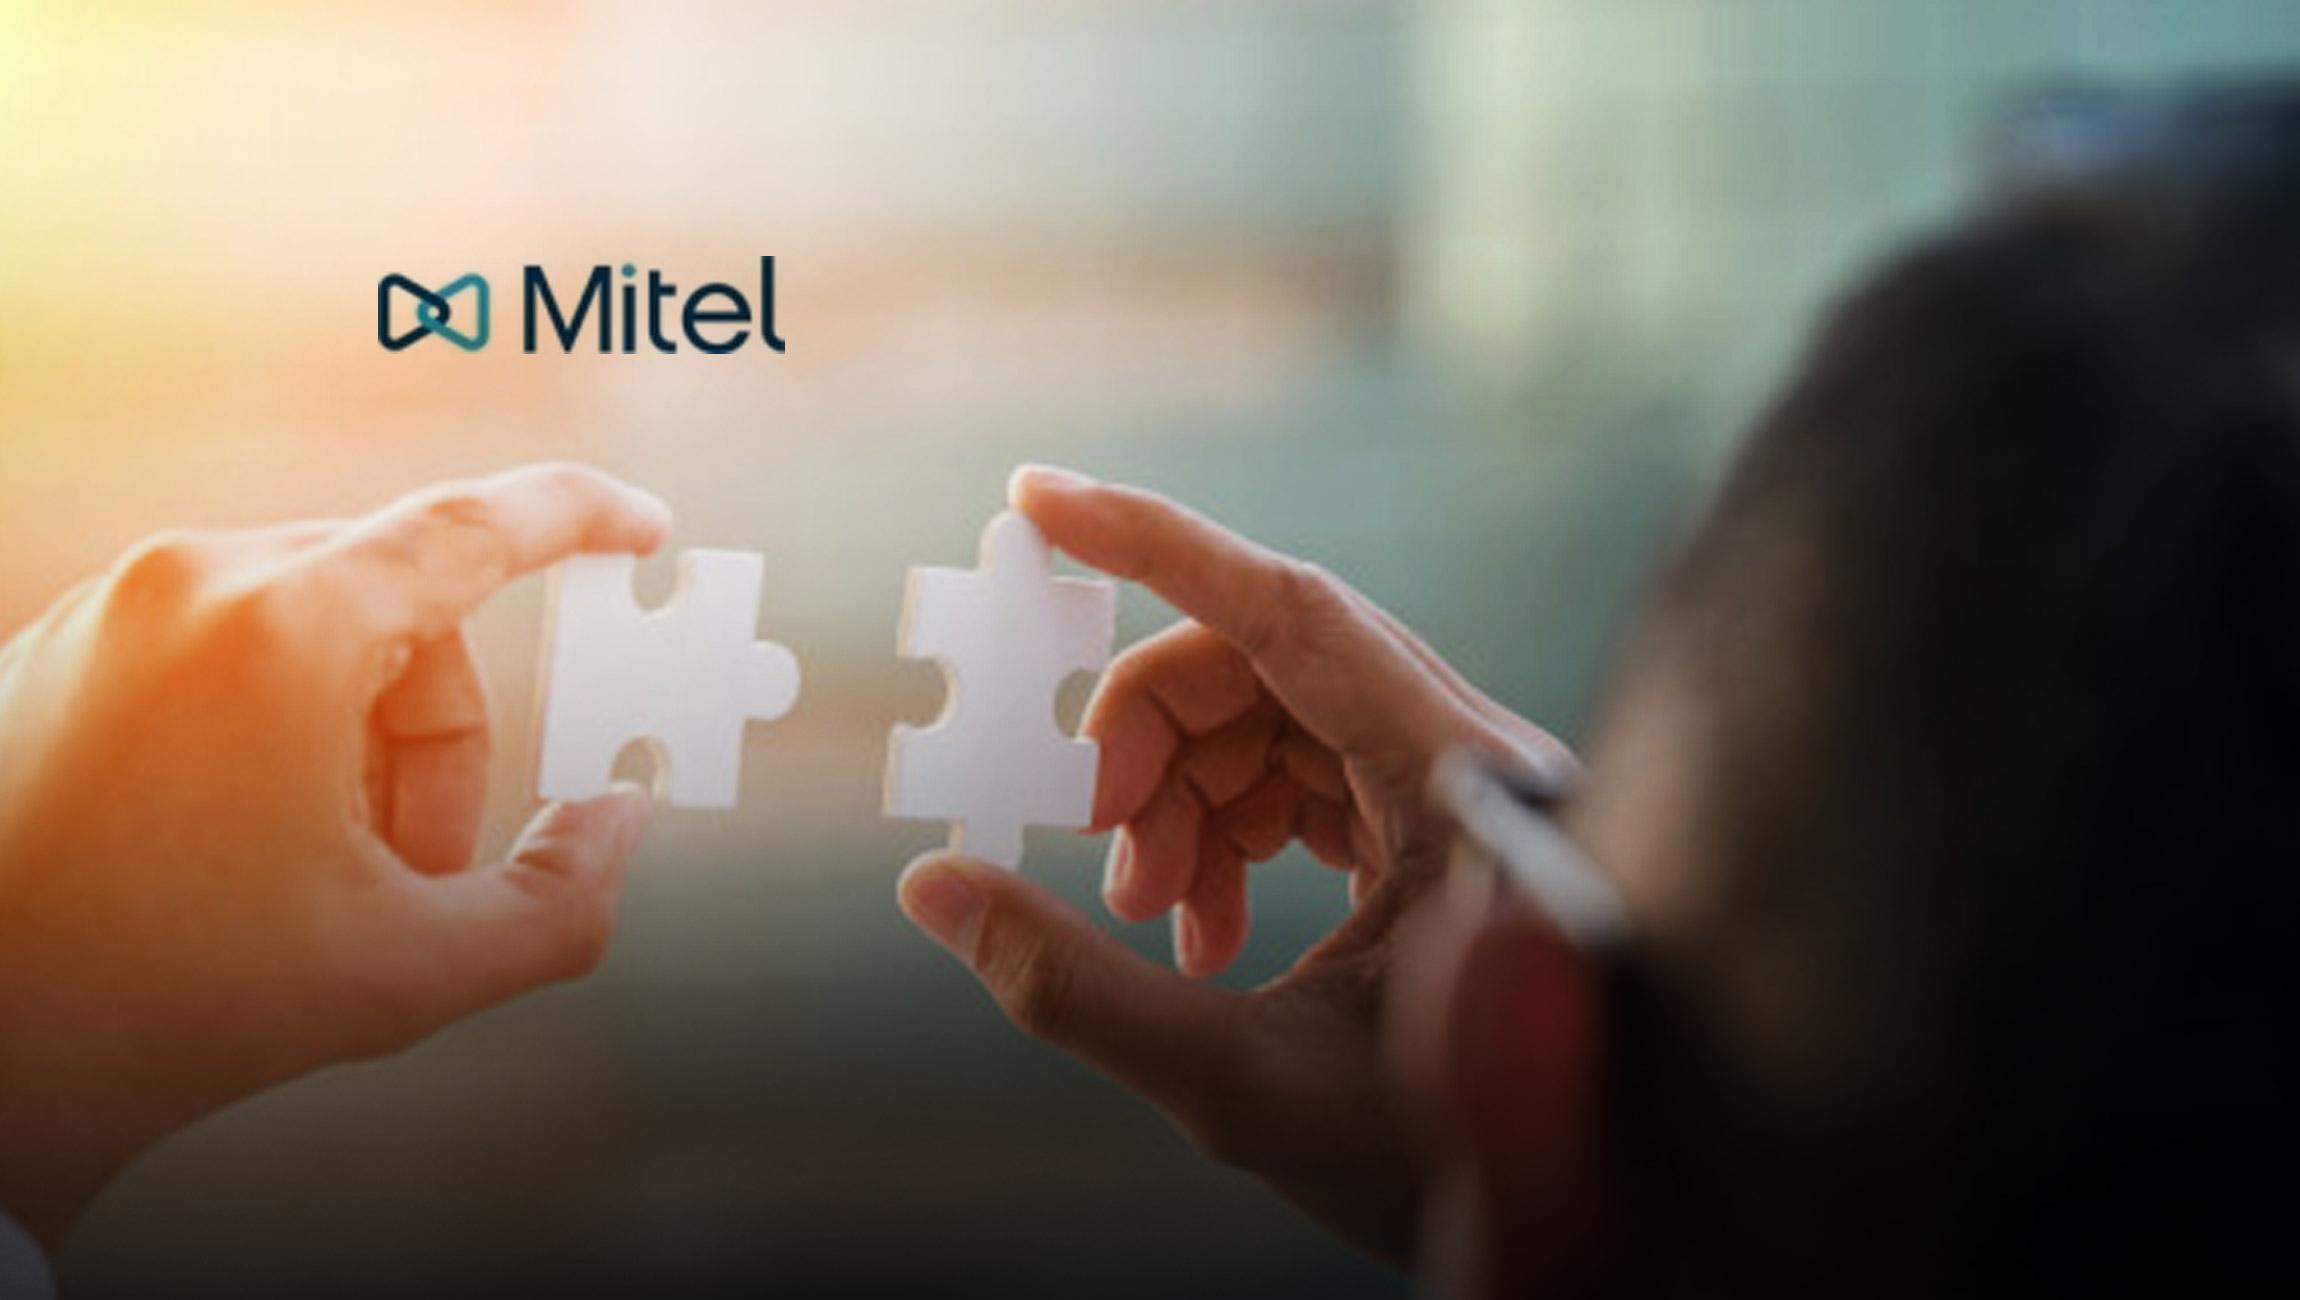 Mitel Launches Wholesale Enterprise Communications and Collaboration Solution Built on Google Cloud